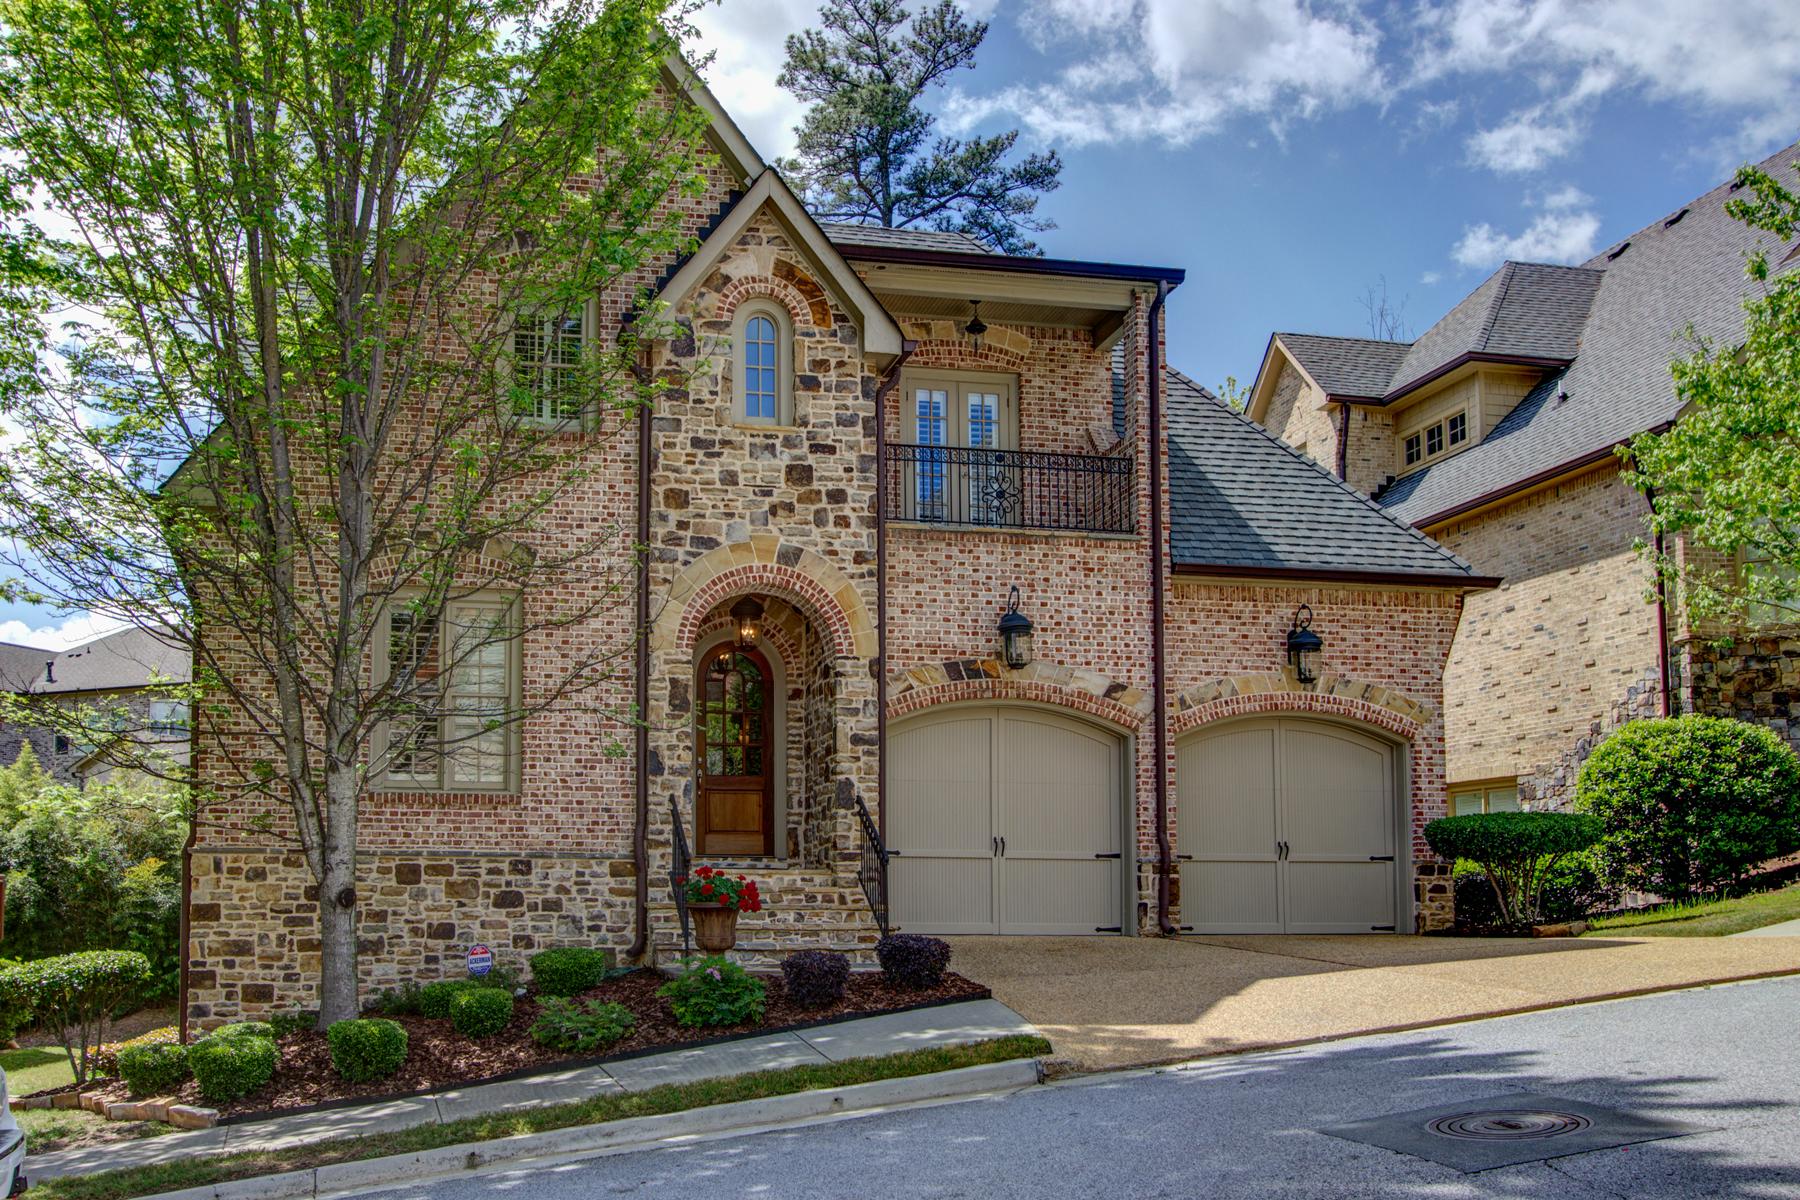 Частный односемейный дом для того Продажа на Immaculate Brick and Stone Executive Home in Charming Brookhaven Setting 1844 Buckhead Valley Lane NE Atlanta, Джорджия, 30324 Соединенные Штаты